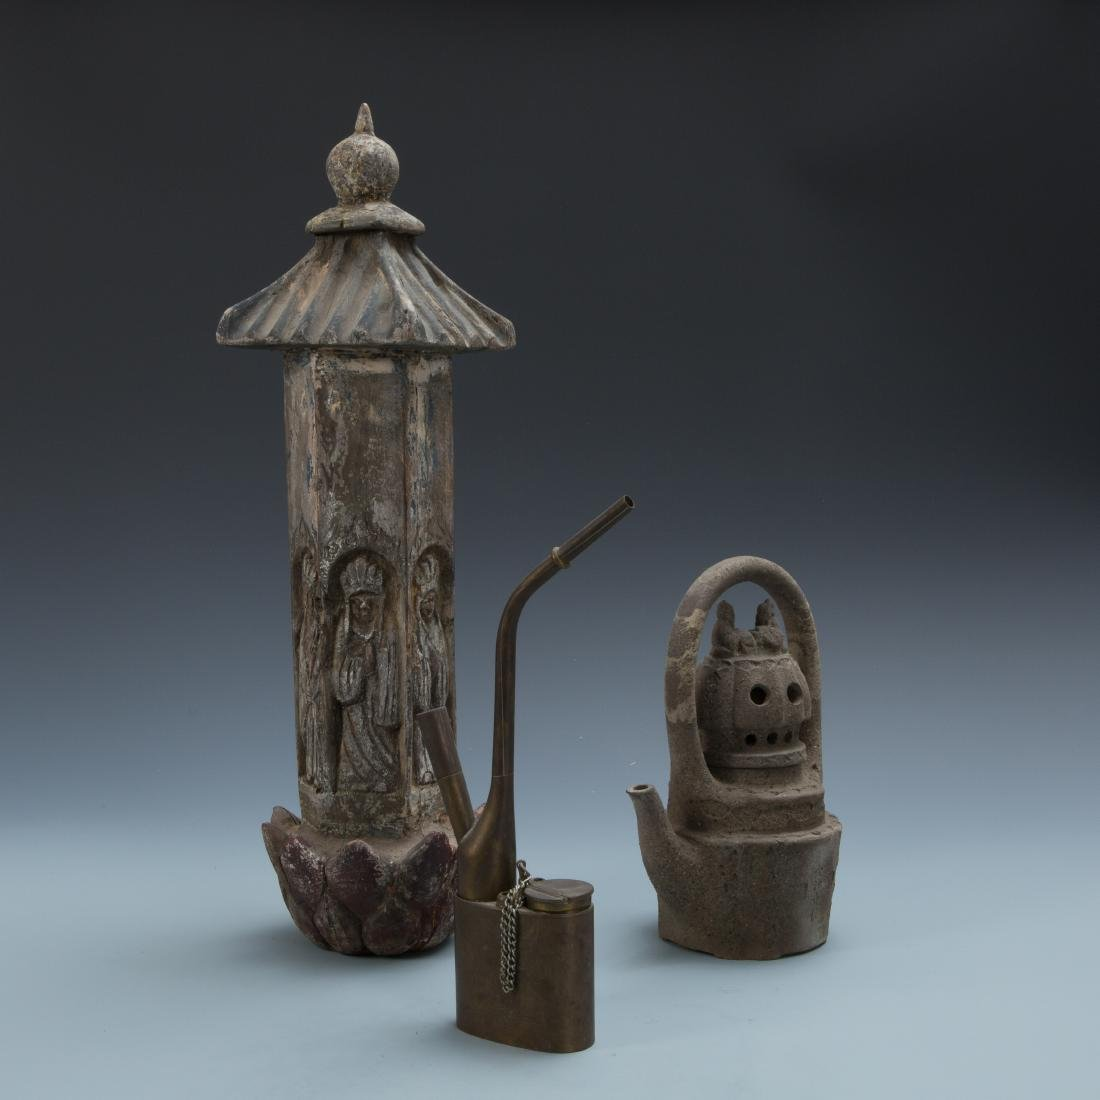 Estate Sale: Opium Pipe Carved Wood Statue Tea Pot